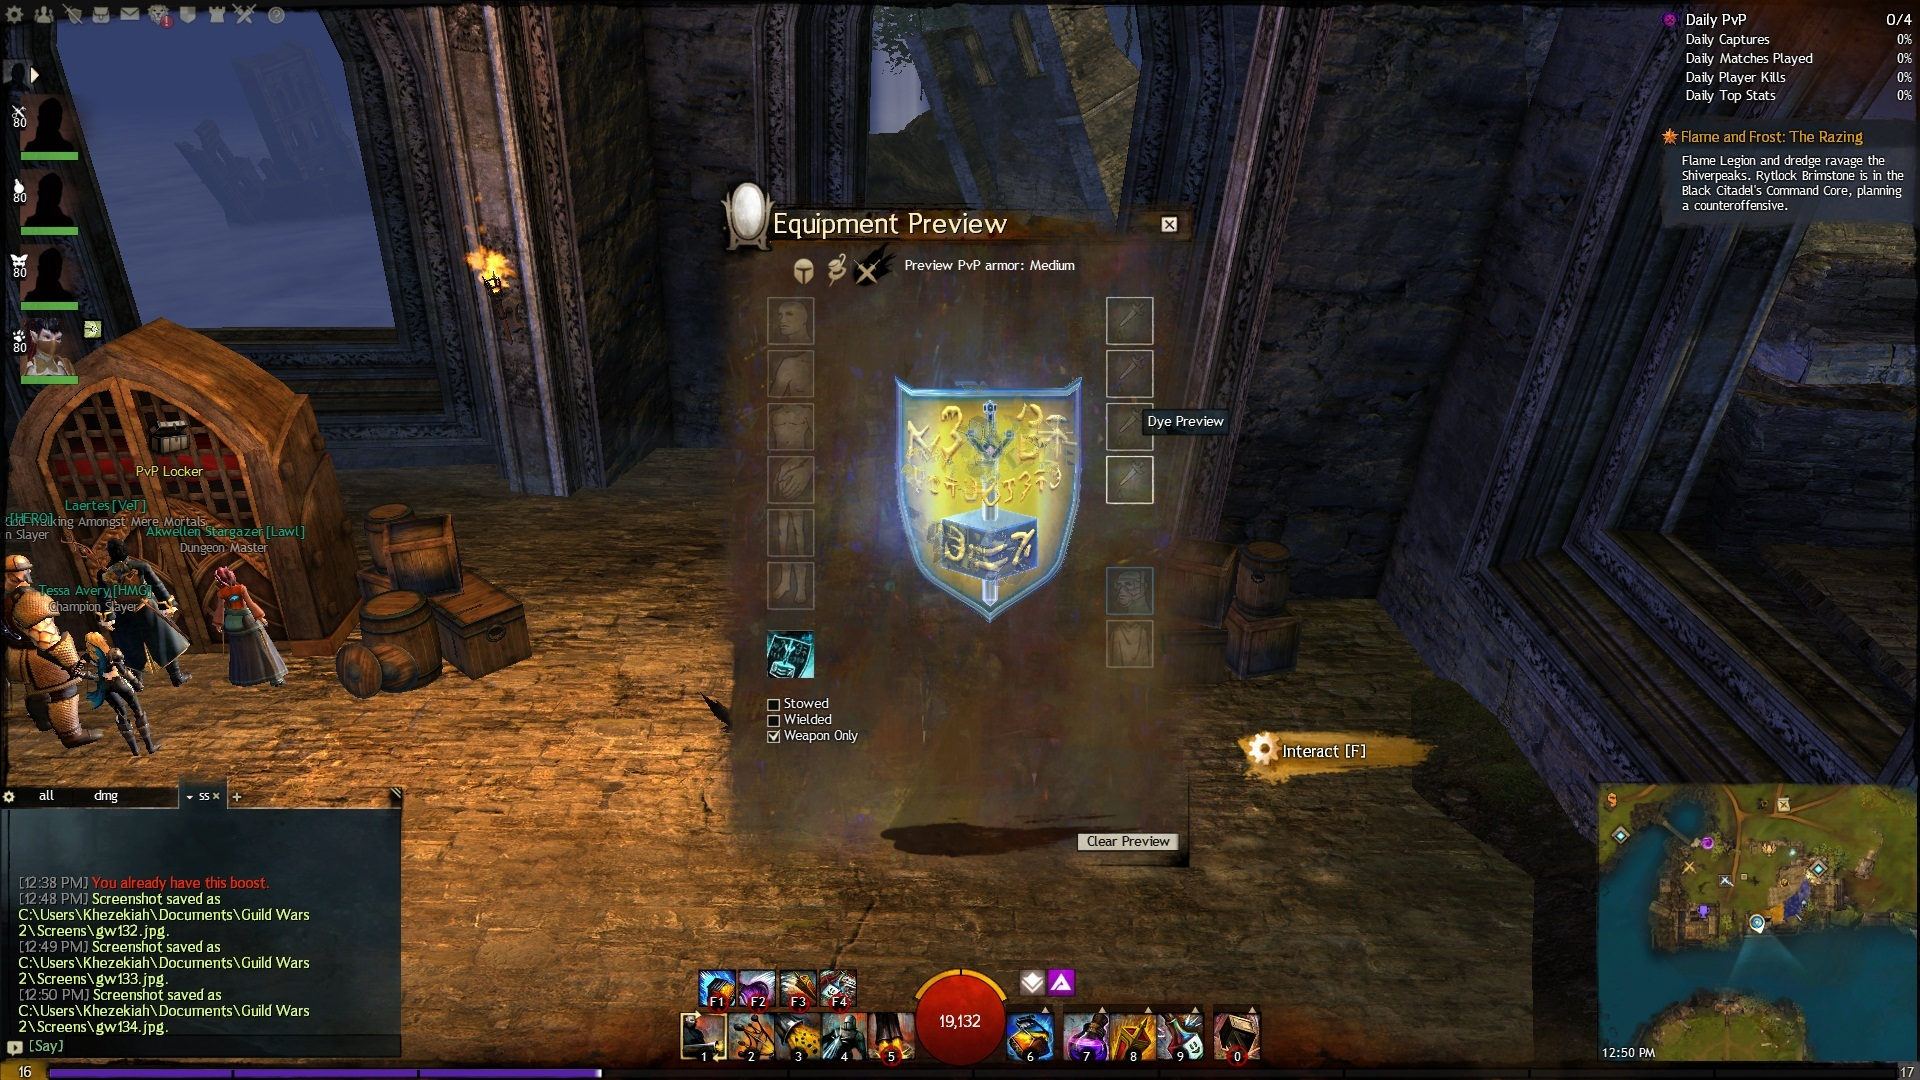 Guild Wars 2 v6: Citadel of Flame Armor Edition - Games - Facepunch